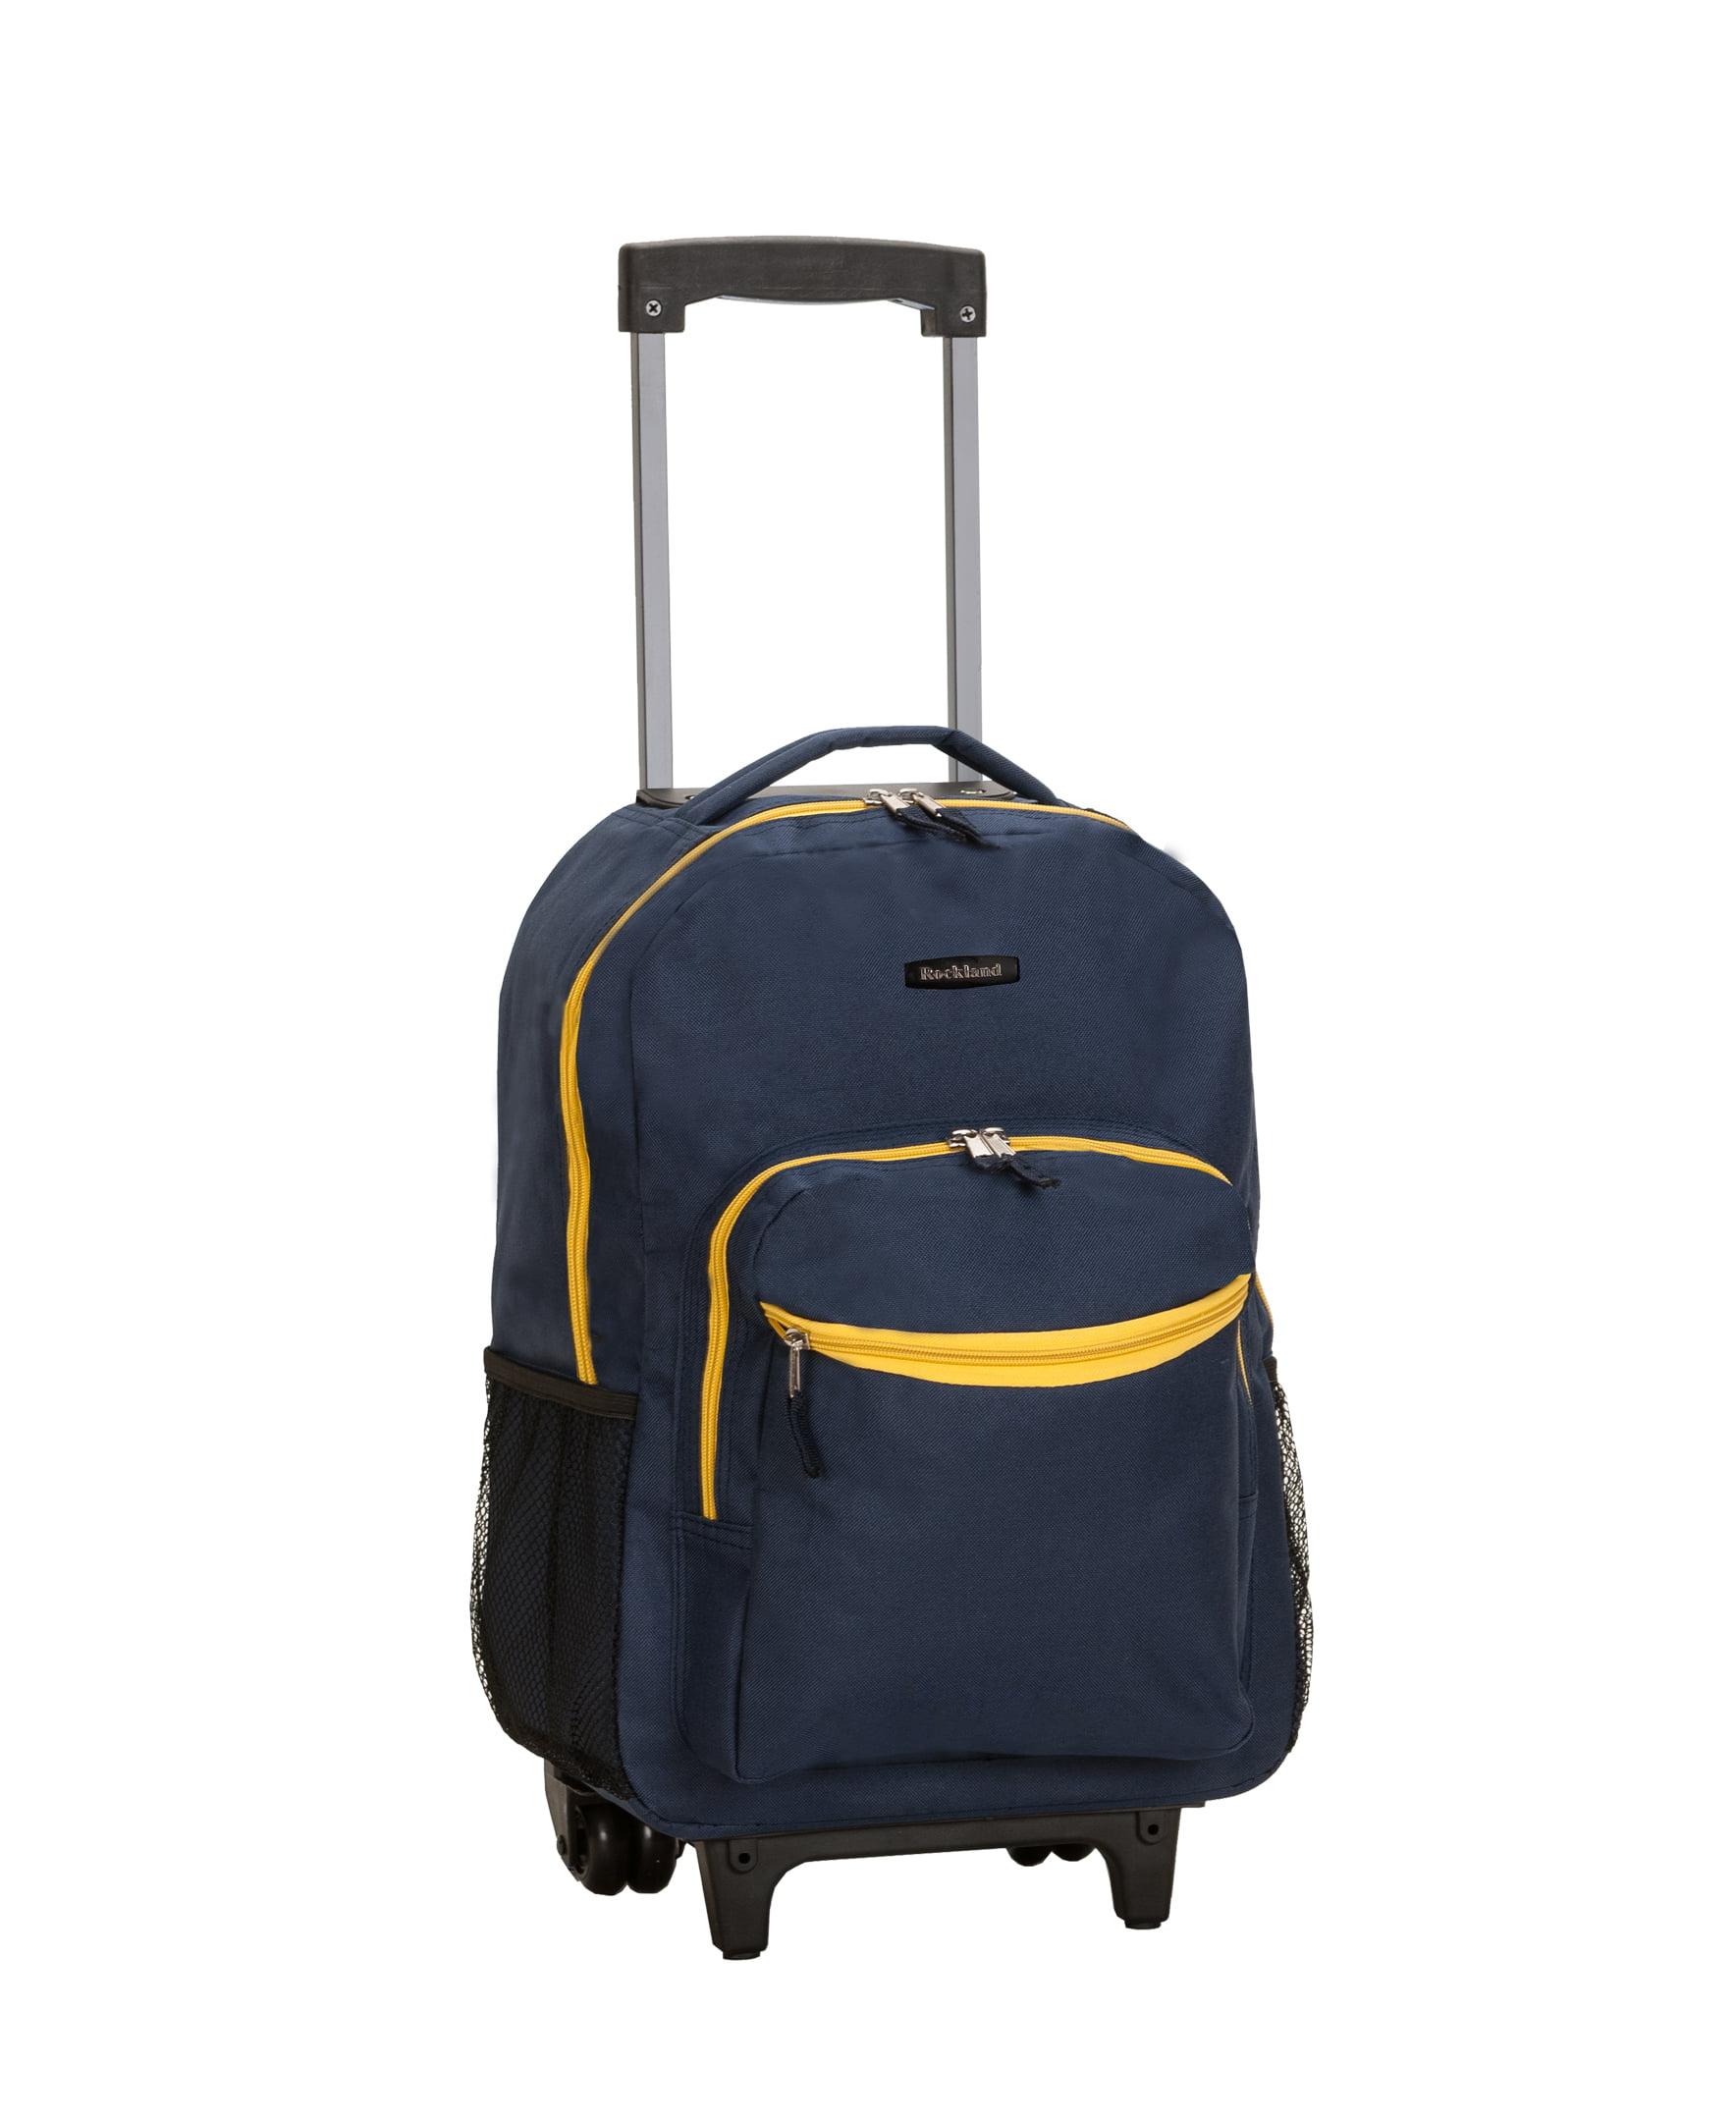 ca23a2c8755f Rockland - Rockland Luggage 17 Rolling Backpack - Walmart.com